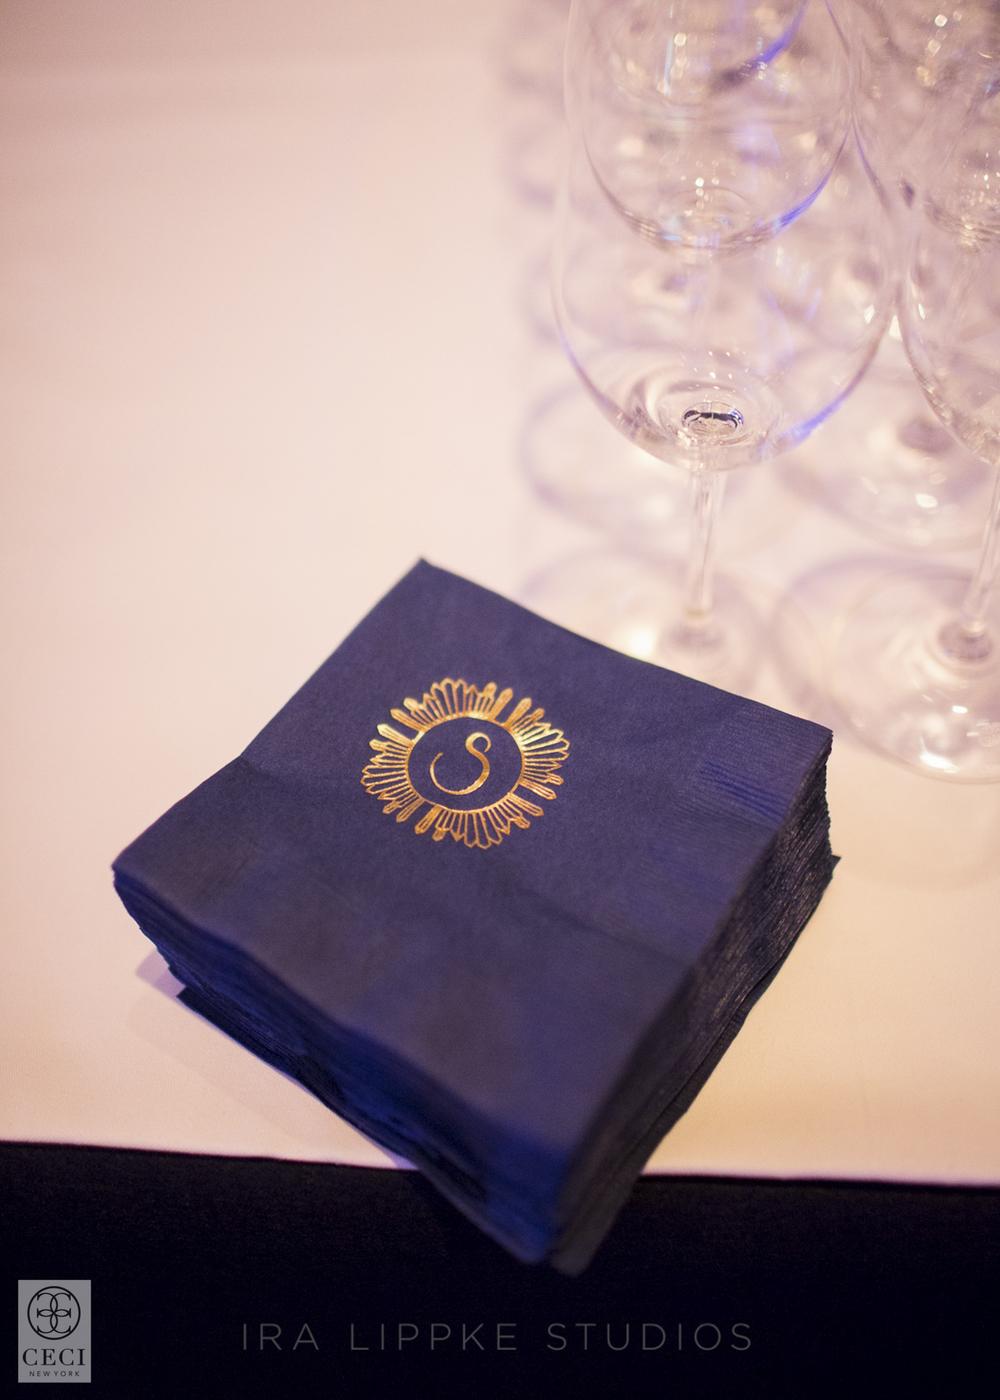 ceci_new_york_kids_party_luxury_invitation_blue_turquoise_teal_gold_bar_bat_mitzvah_art_deco_modern_event_planning_four_seasons_new_york_city-1.jpg